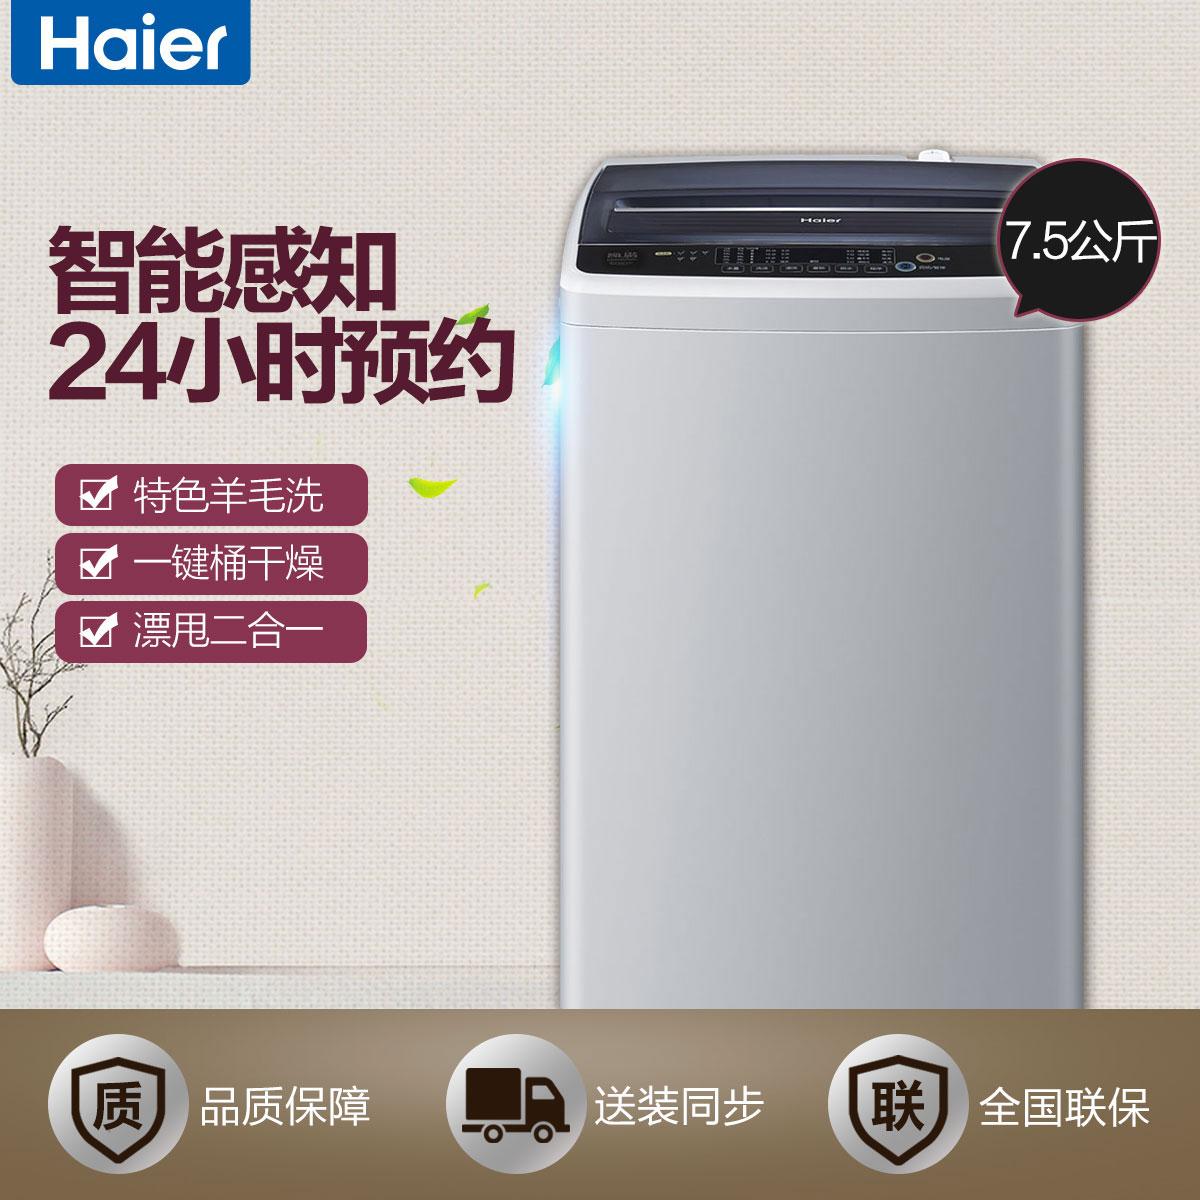 Haier/海尔 波轮洗衣机 EB75M2WH